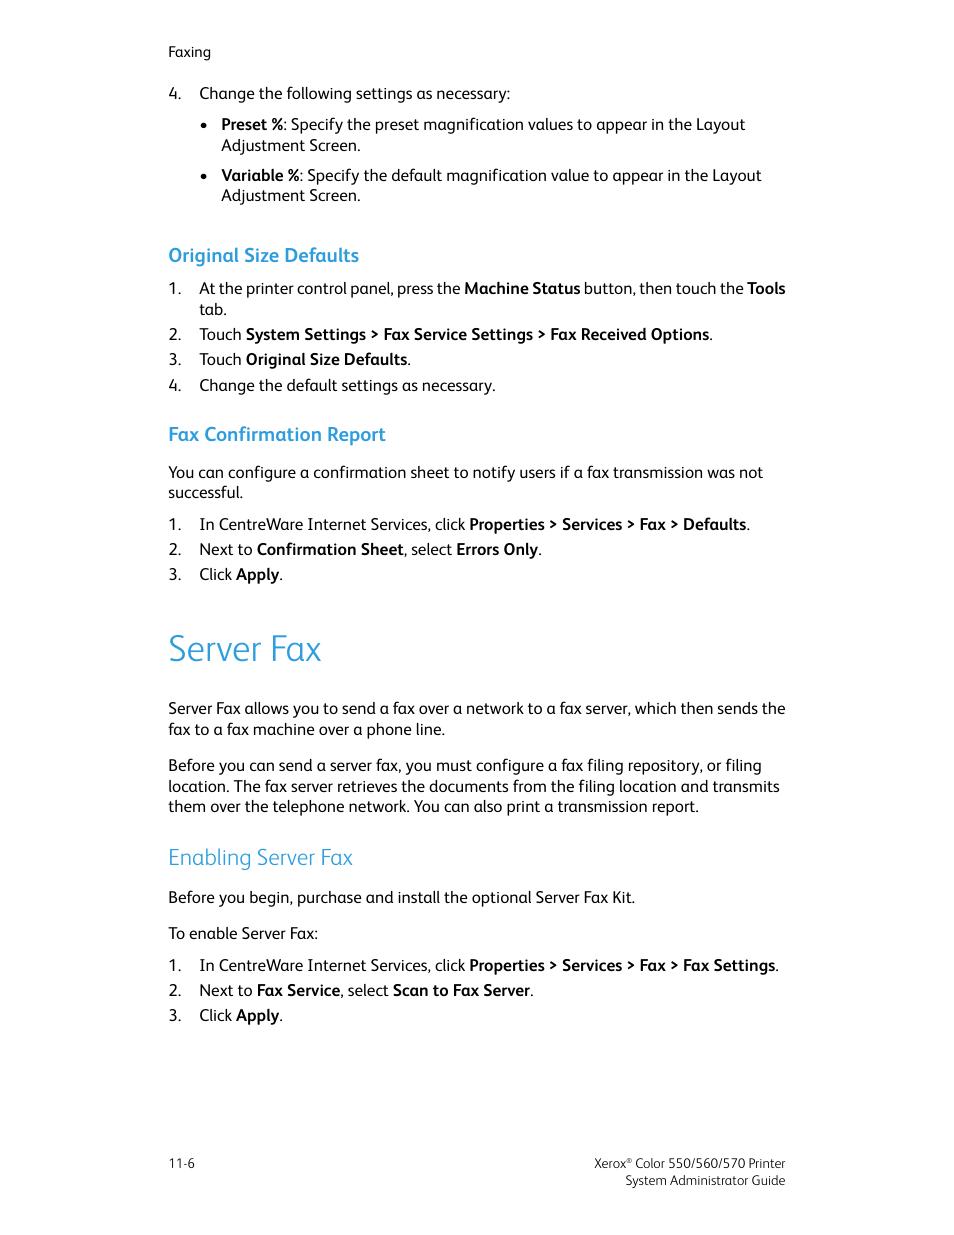 original size defaults fax confirmation report server fax xerox